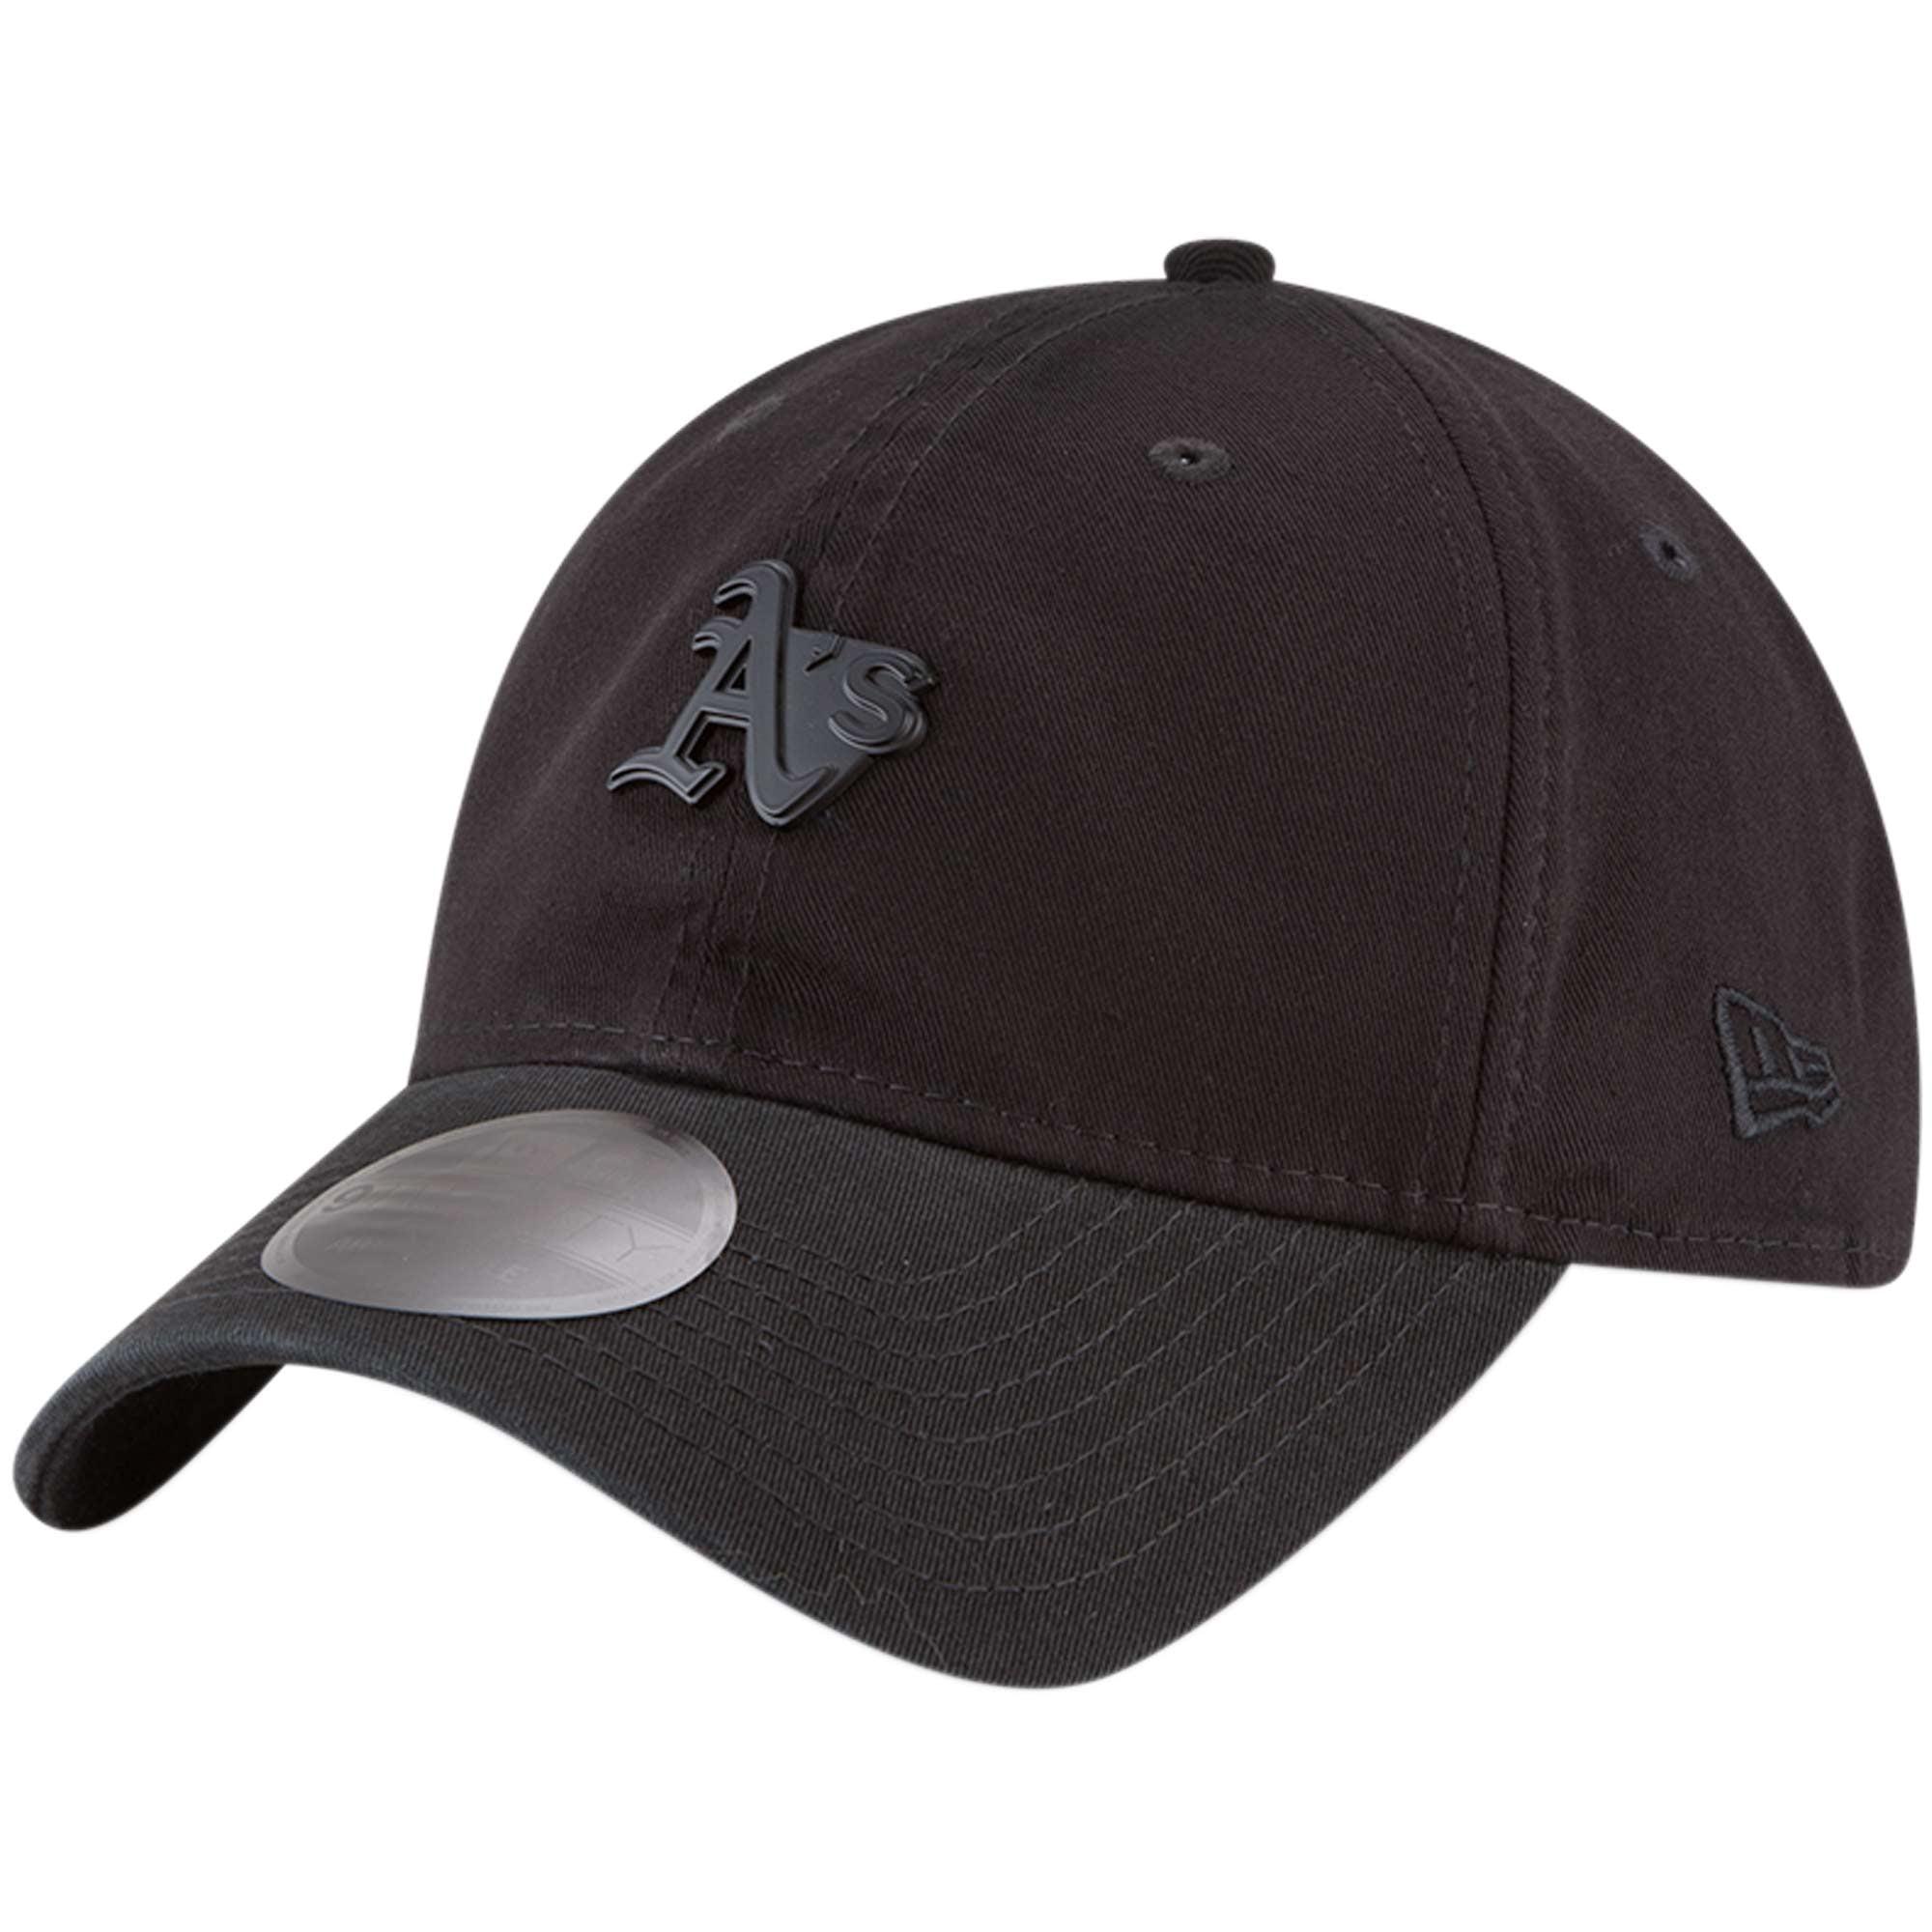 Oakland Athletics New Era Micro Matte 9TWENTY Adjustable Hat - Black - OSFA